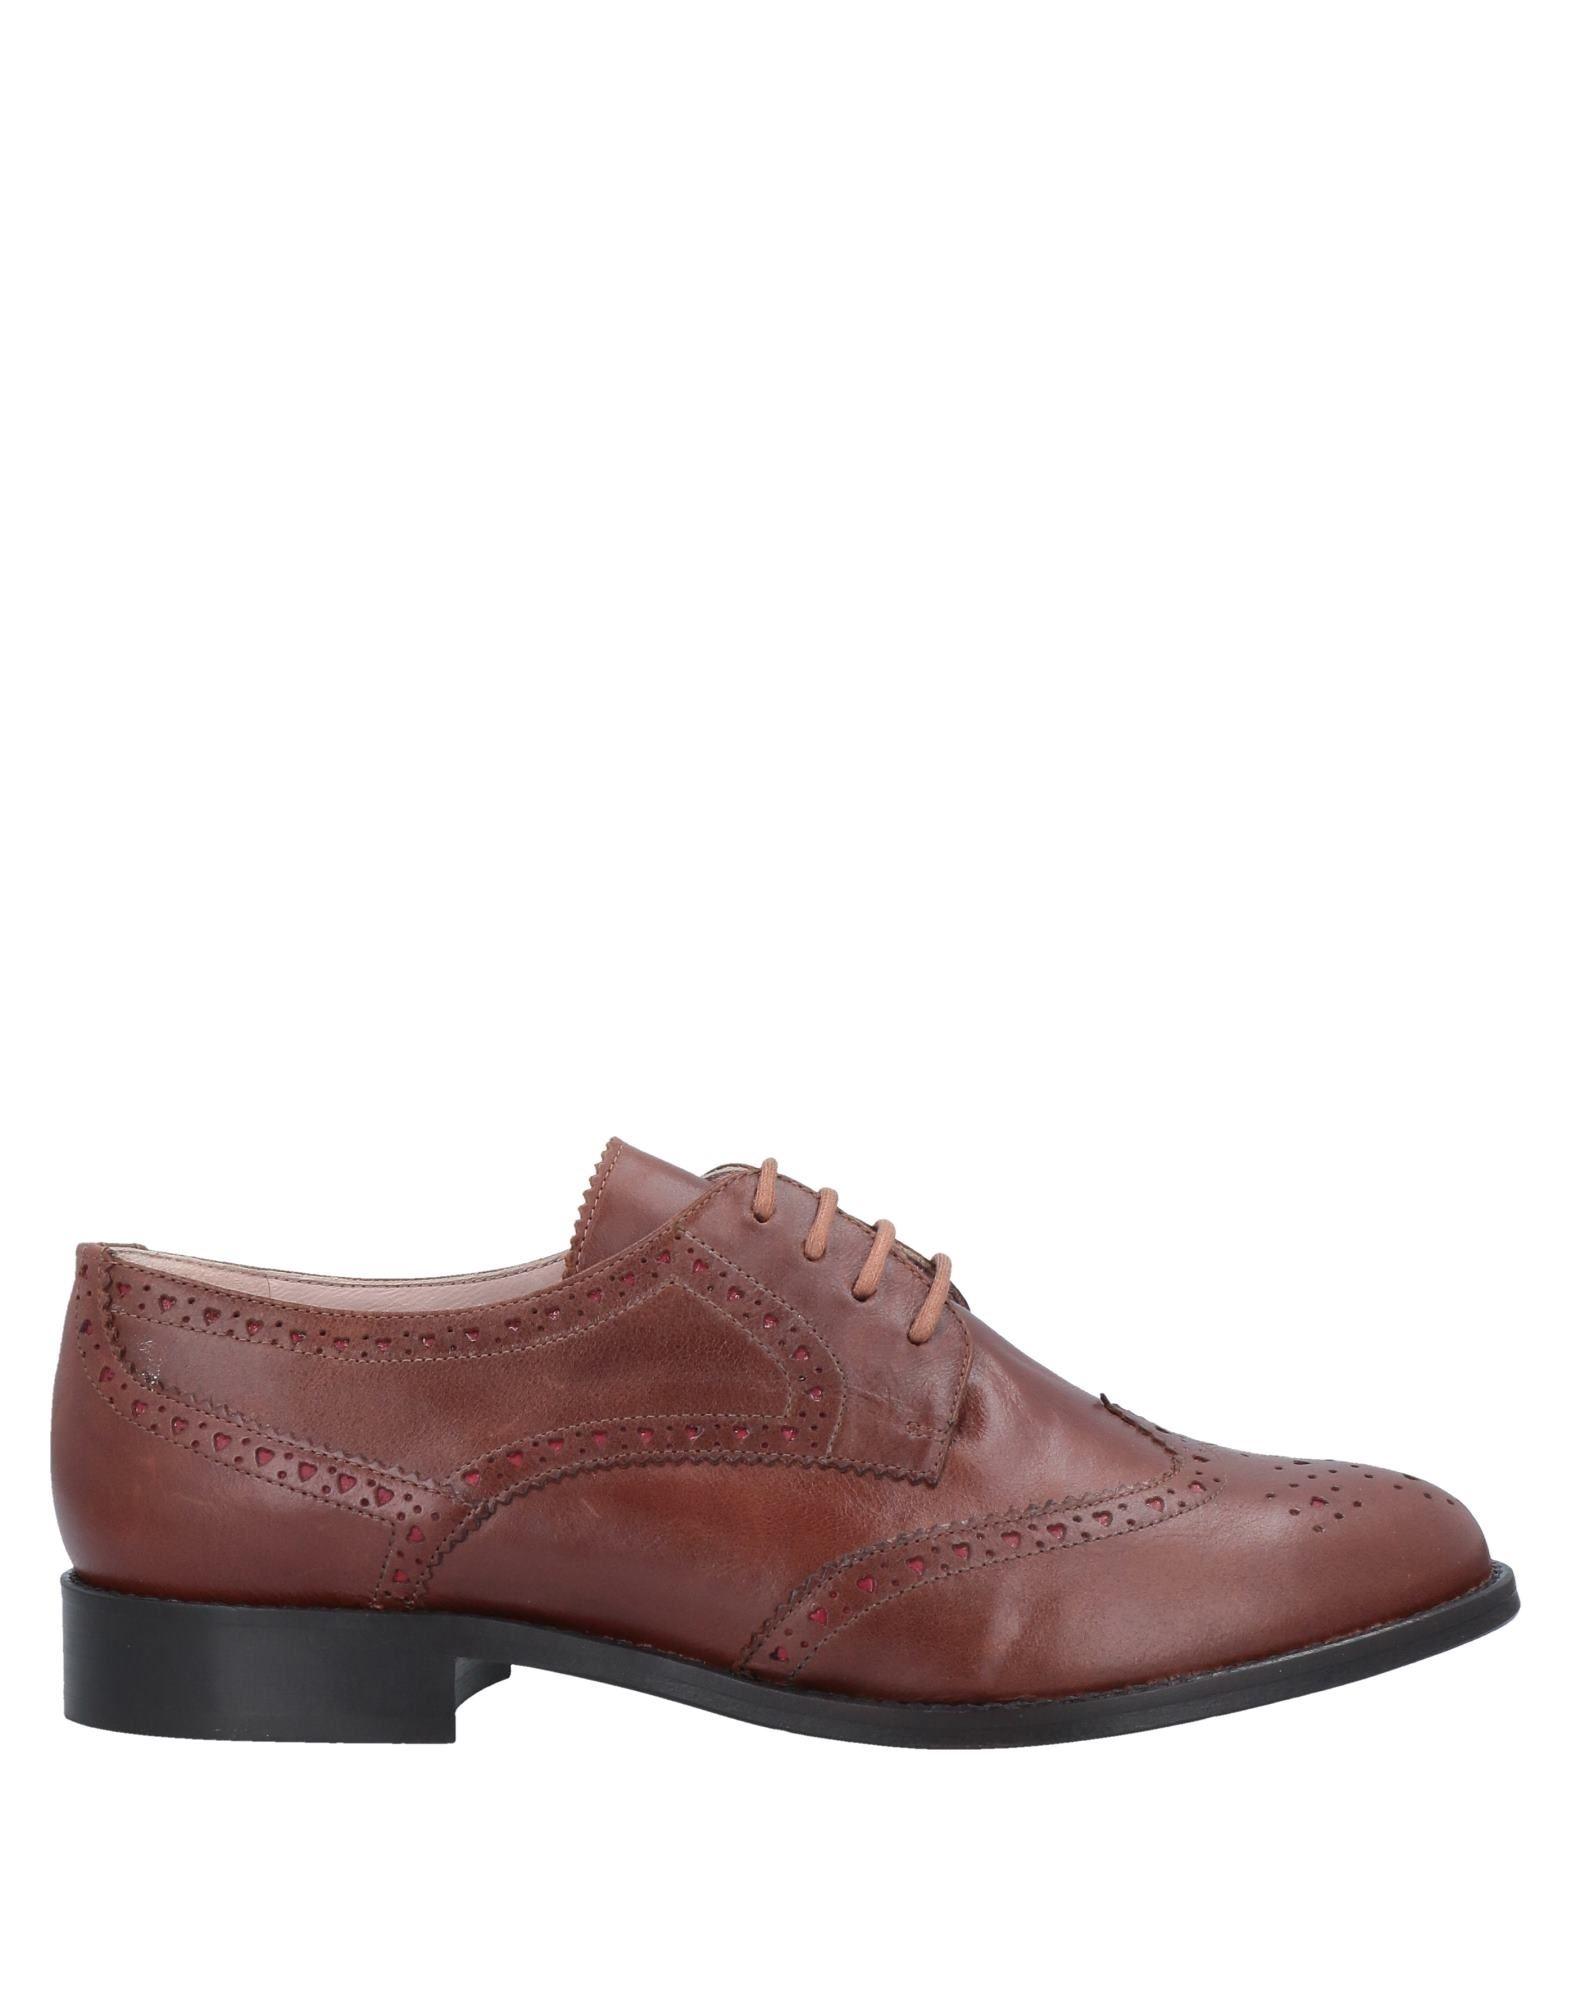 L by MISS L-FIRE Обувь на шнурках claudia by isaberi обувь на шнурках